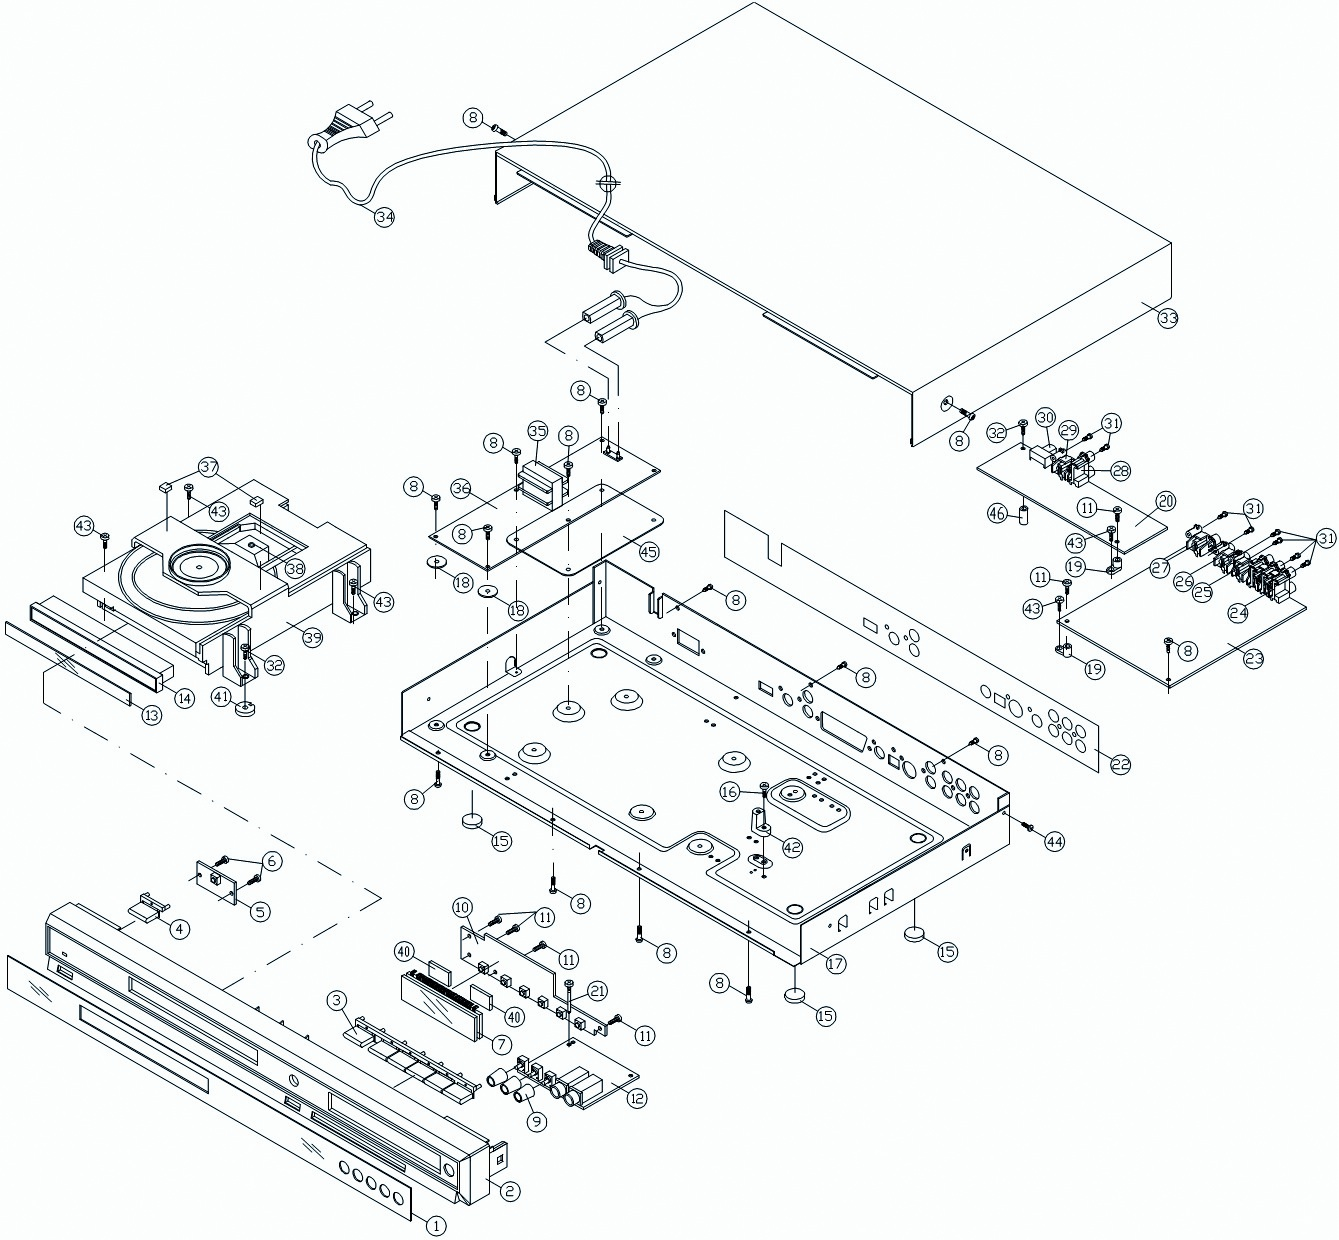 Akira DVD 2012SE – SMPS Circuit Diagram